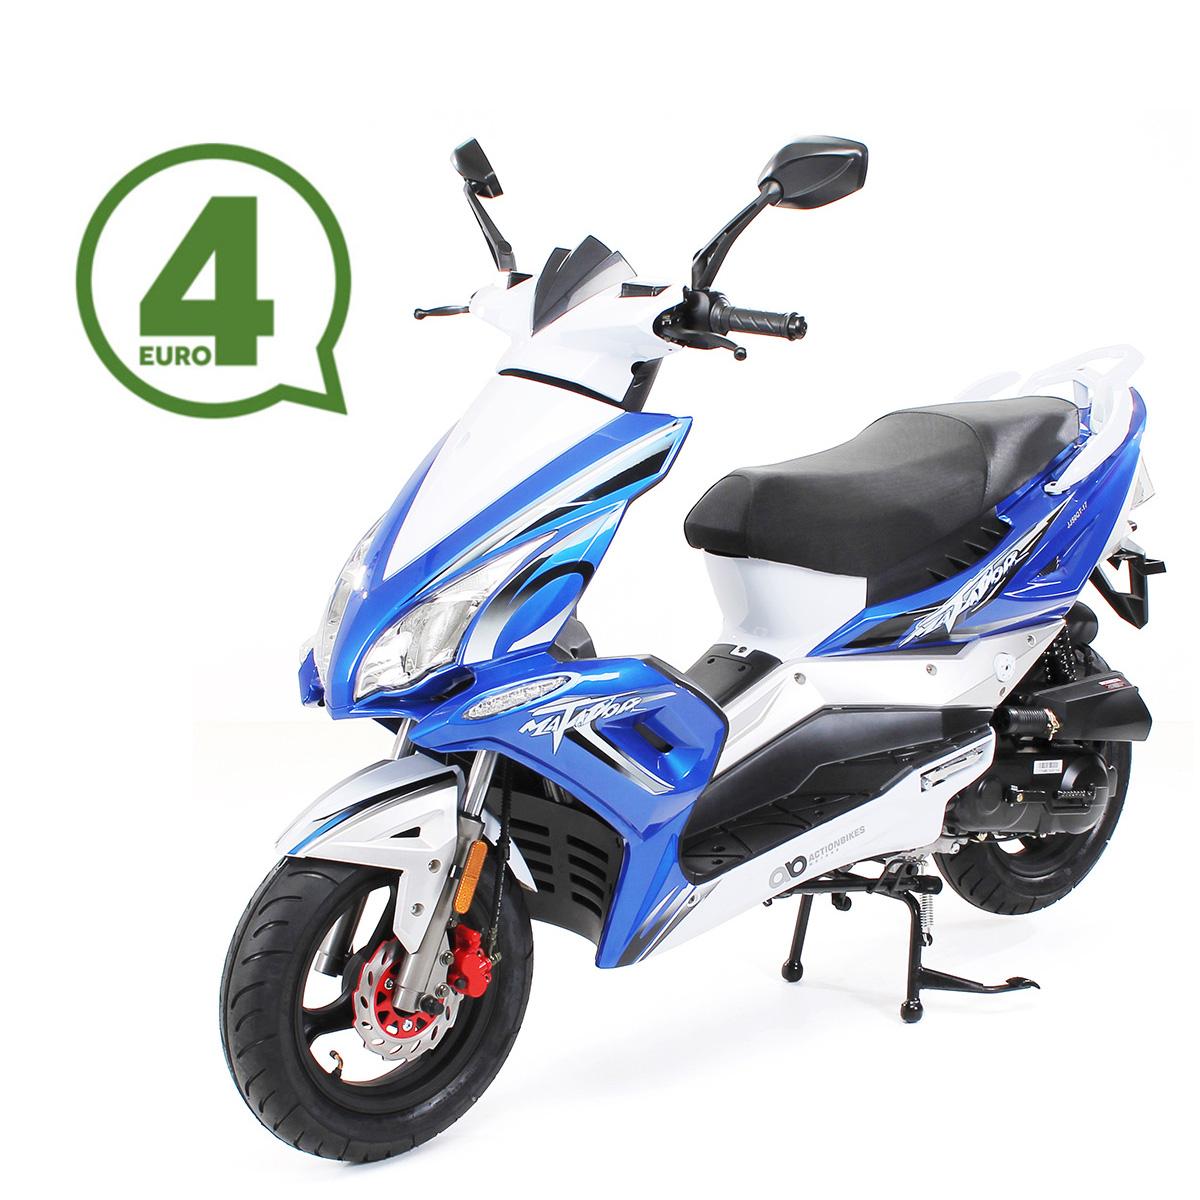 Matador JJ50QT-17 Motorroller Mokick 45 km/h blau-weiß Euro 4